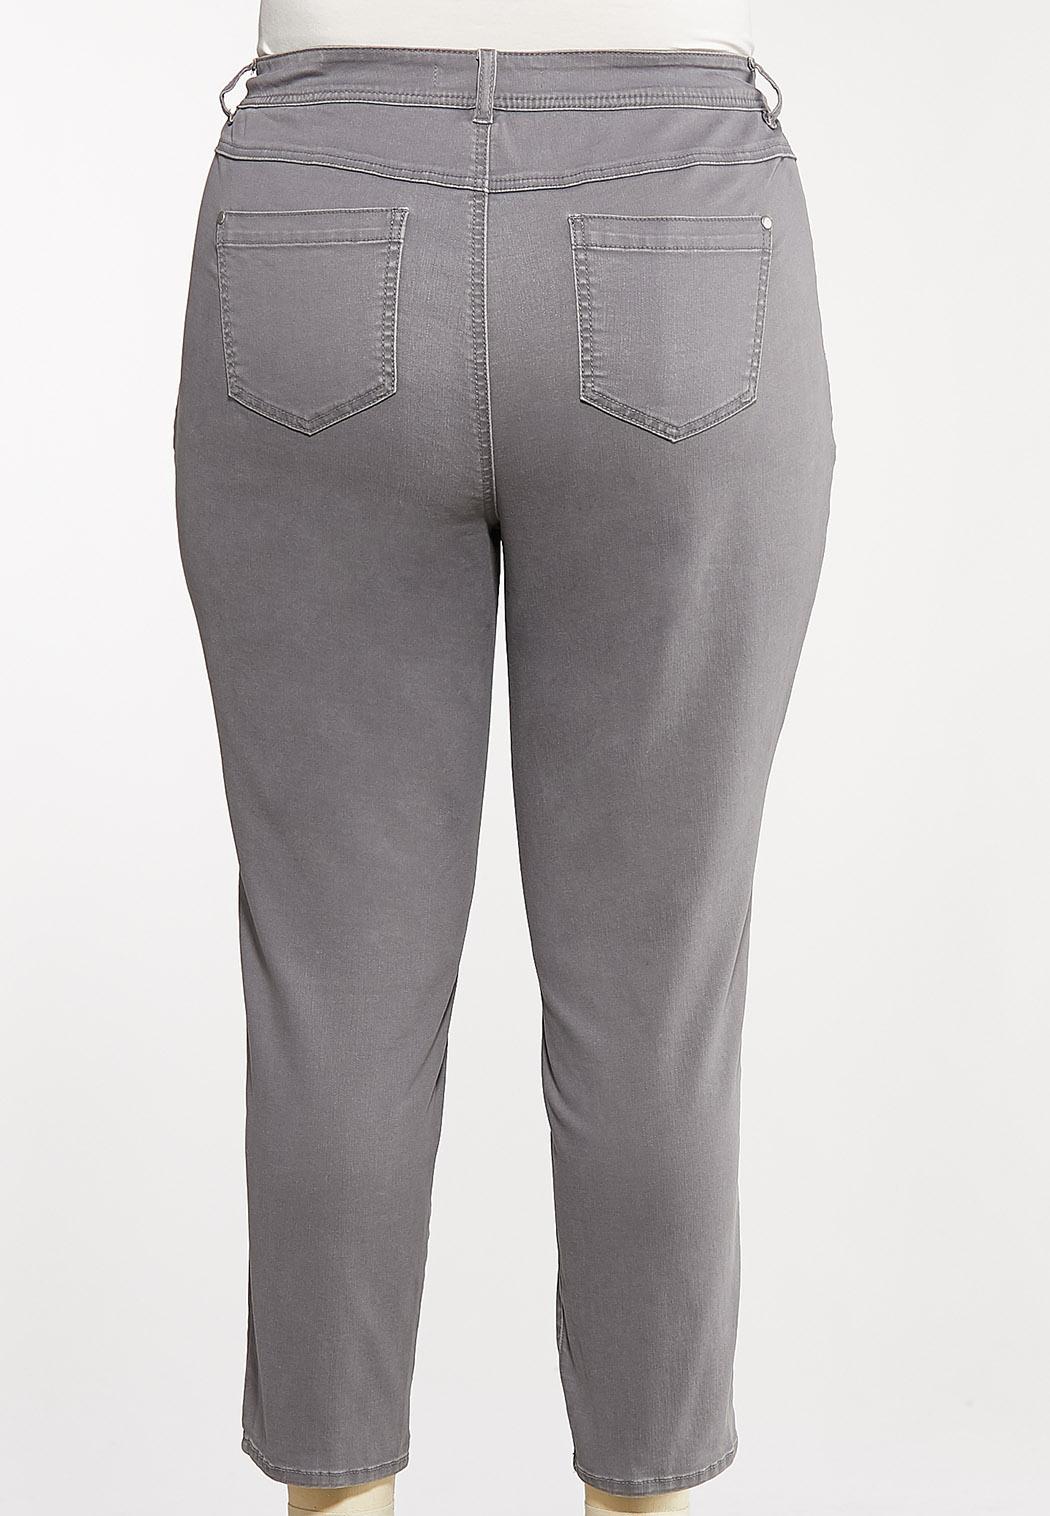 Plus Size Gray Ankle Pants (Item #44072205)